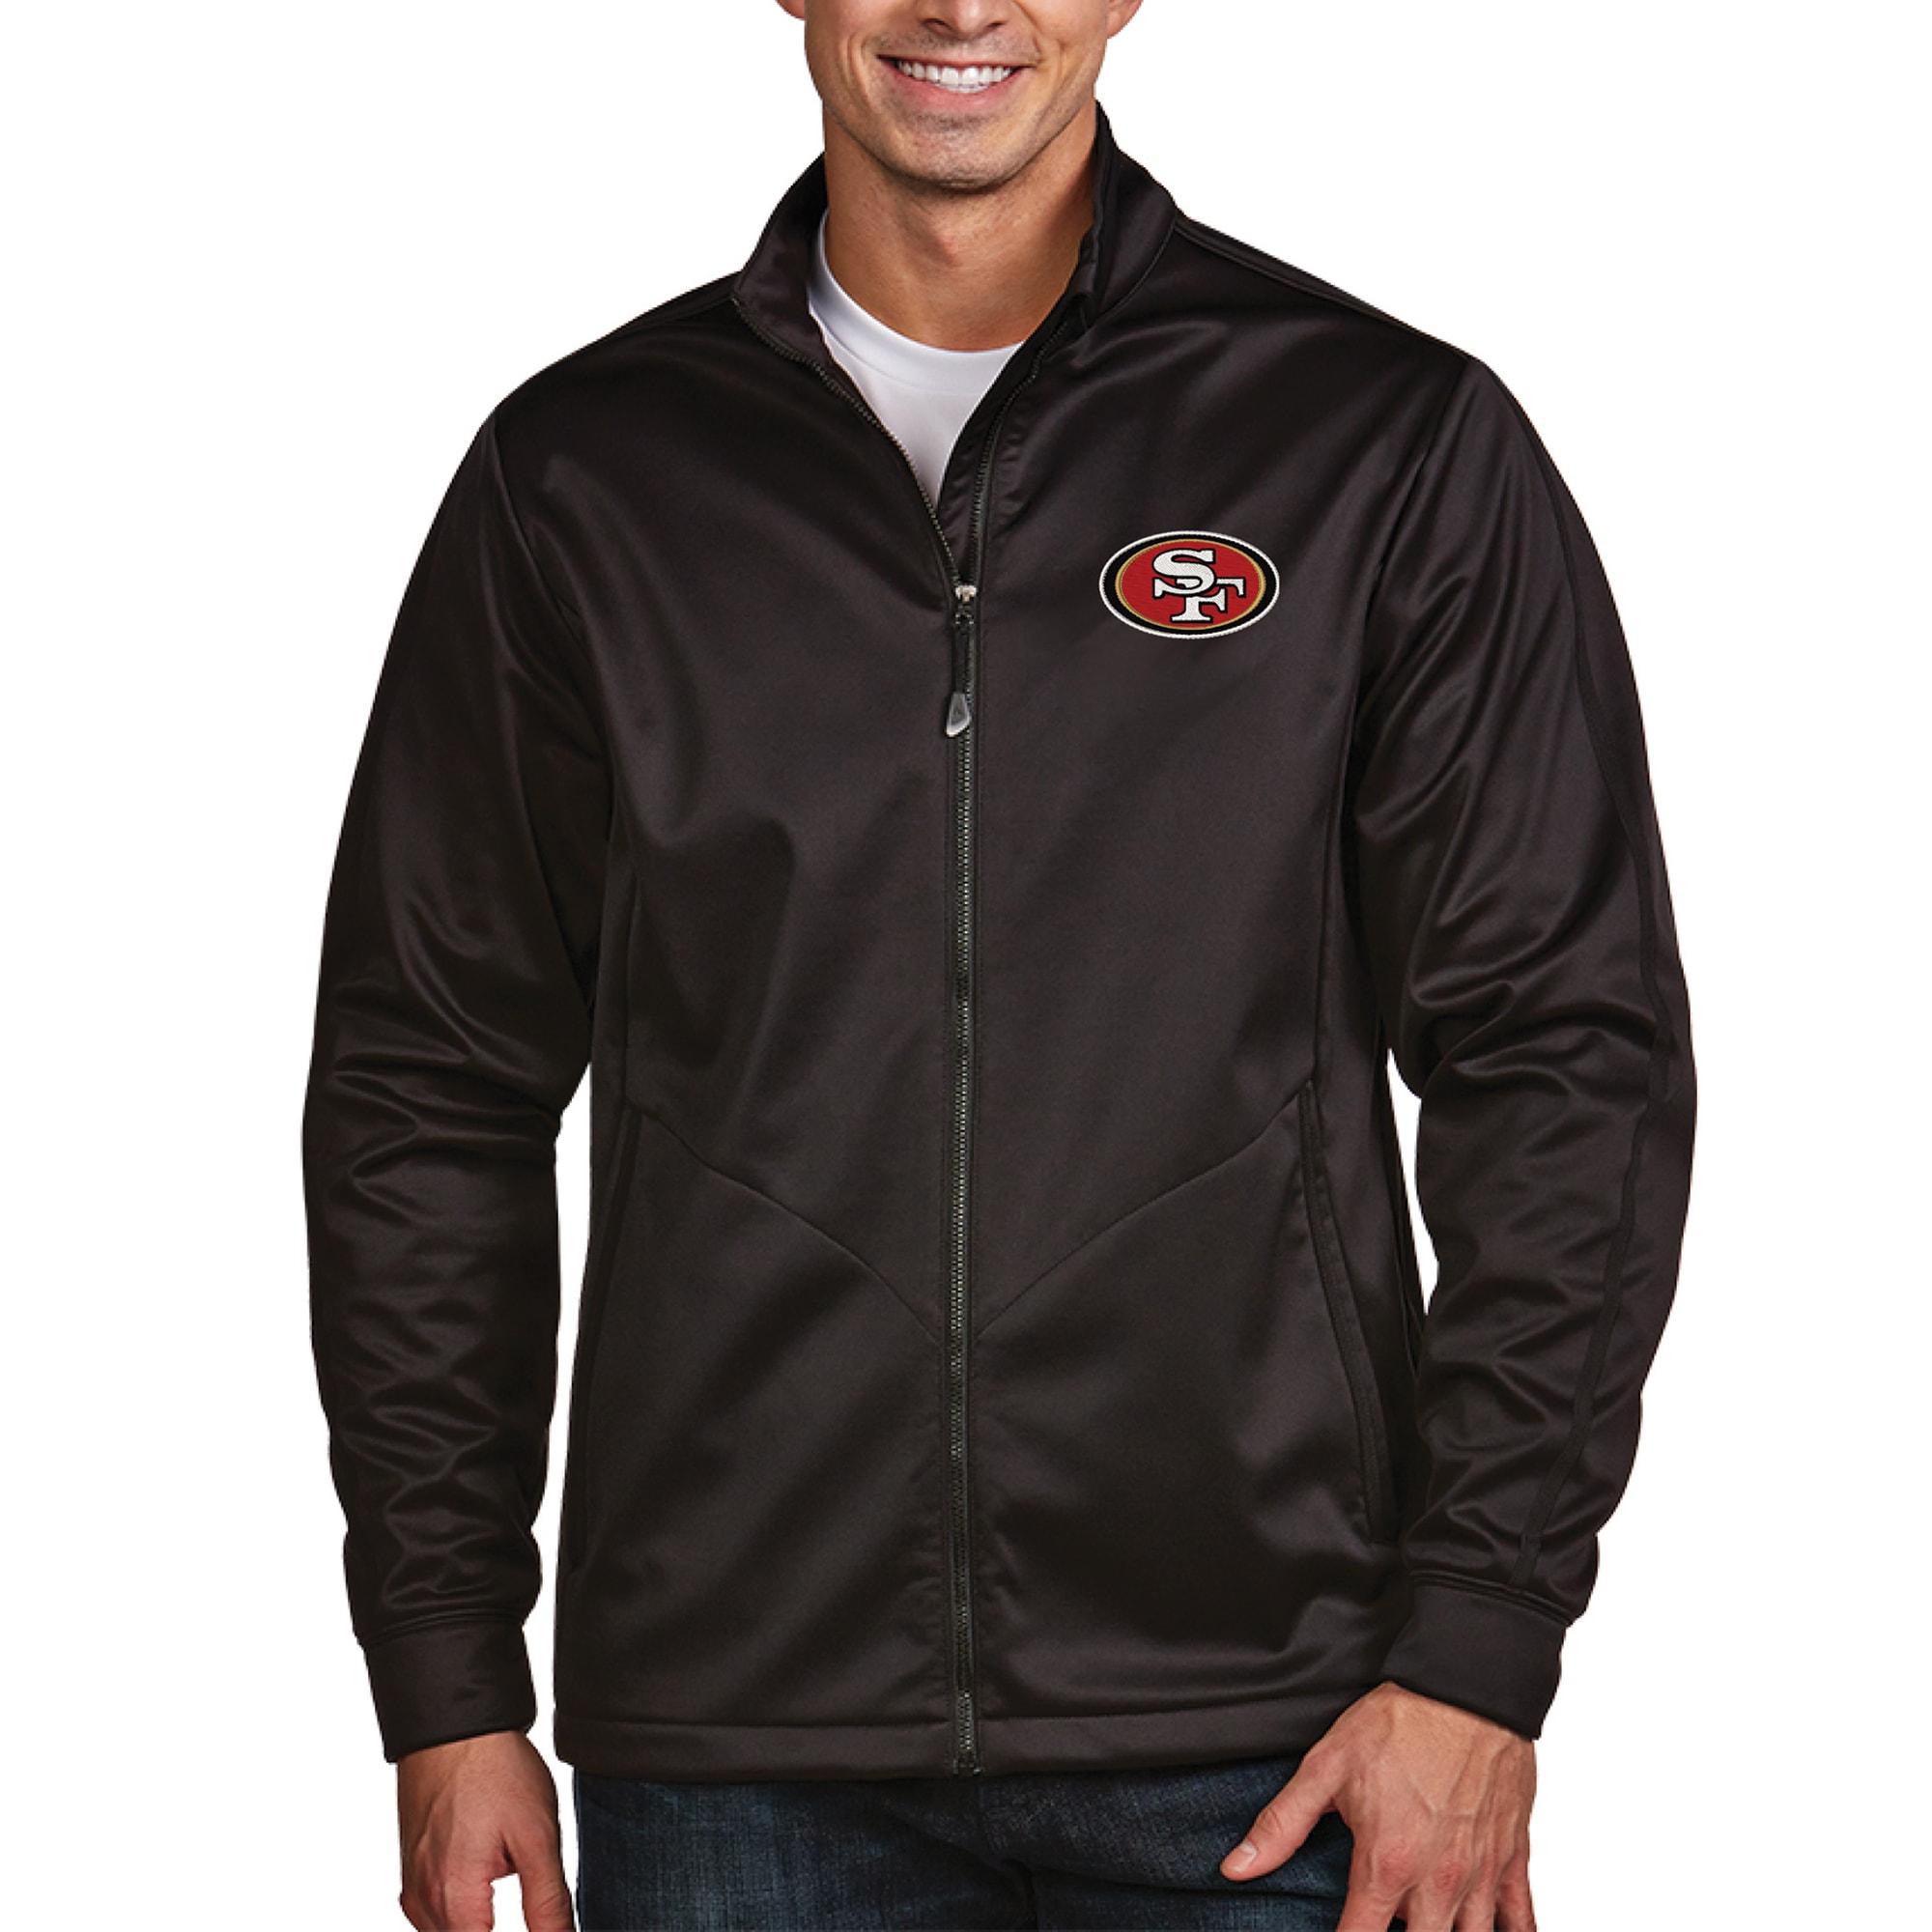 San Francisco 49ers Antigua Full-Zip Golf Jacket - Black